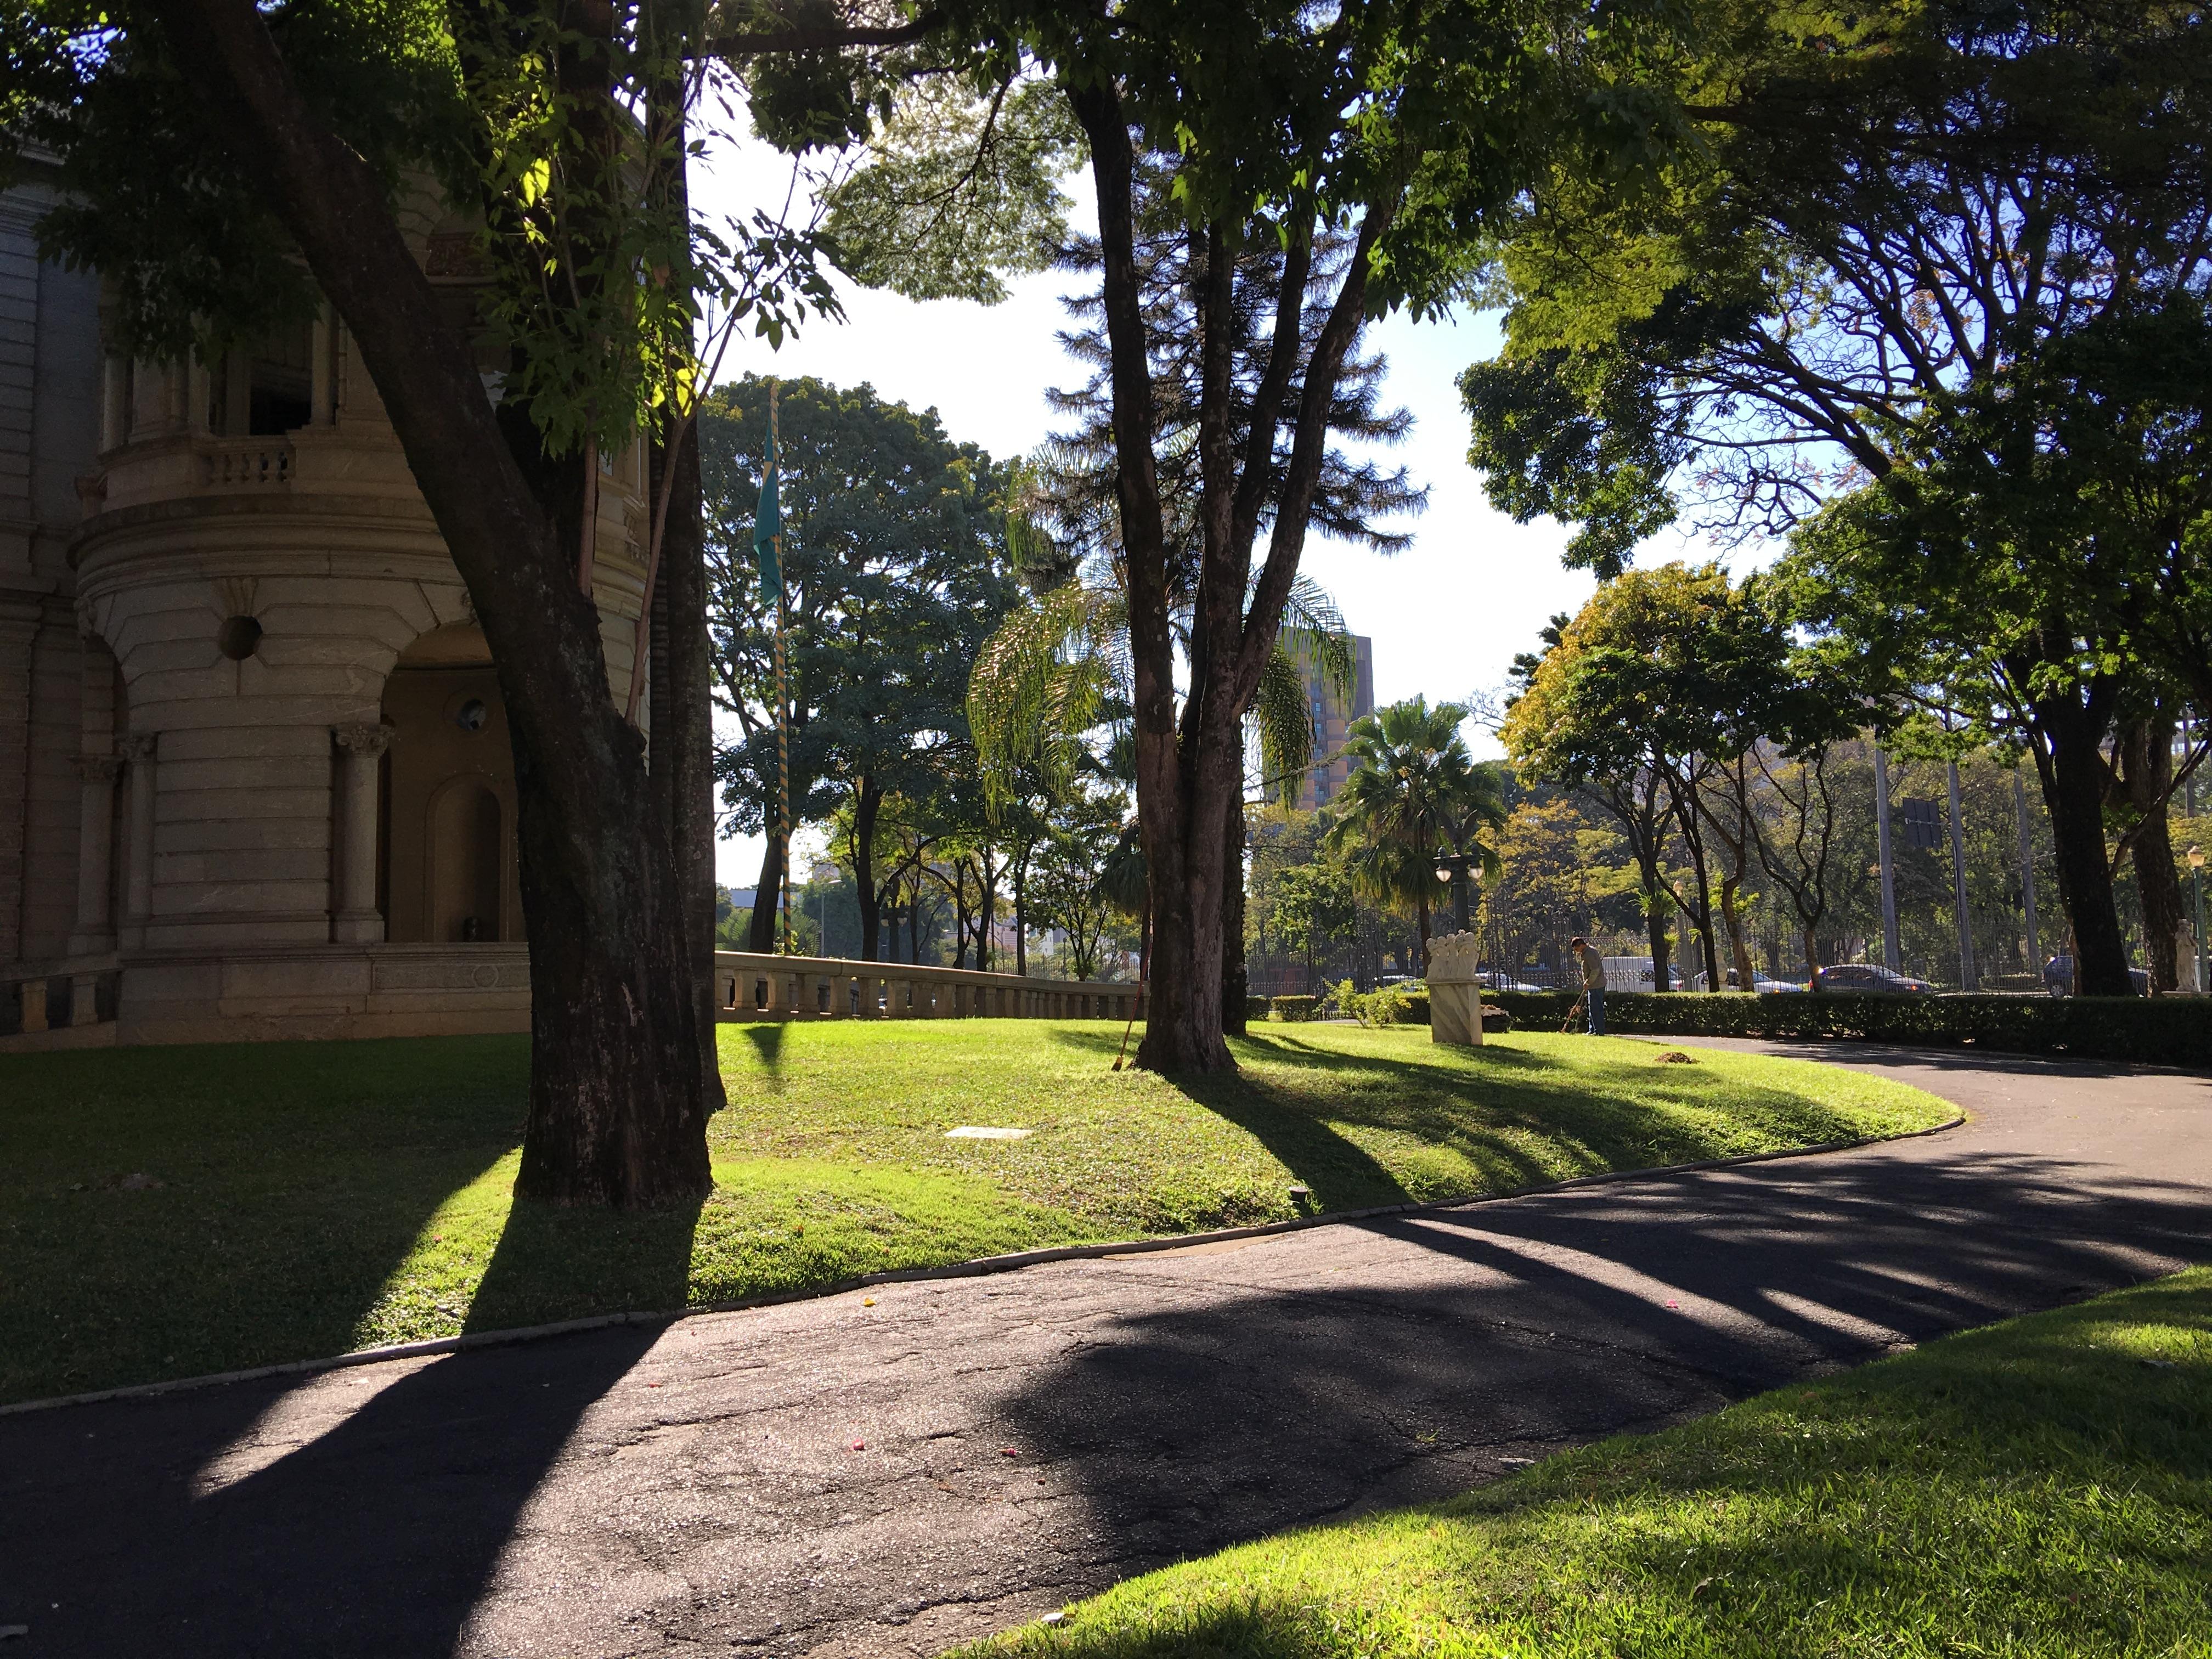 Palácio da Liberdad